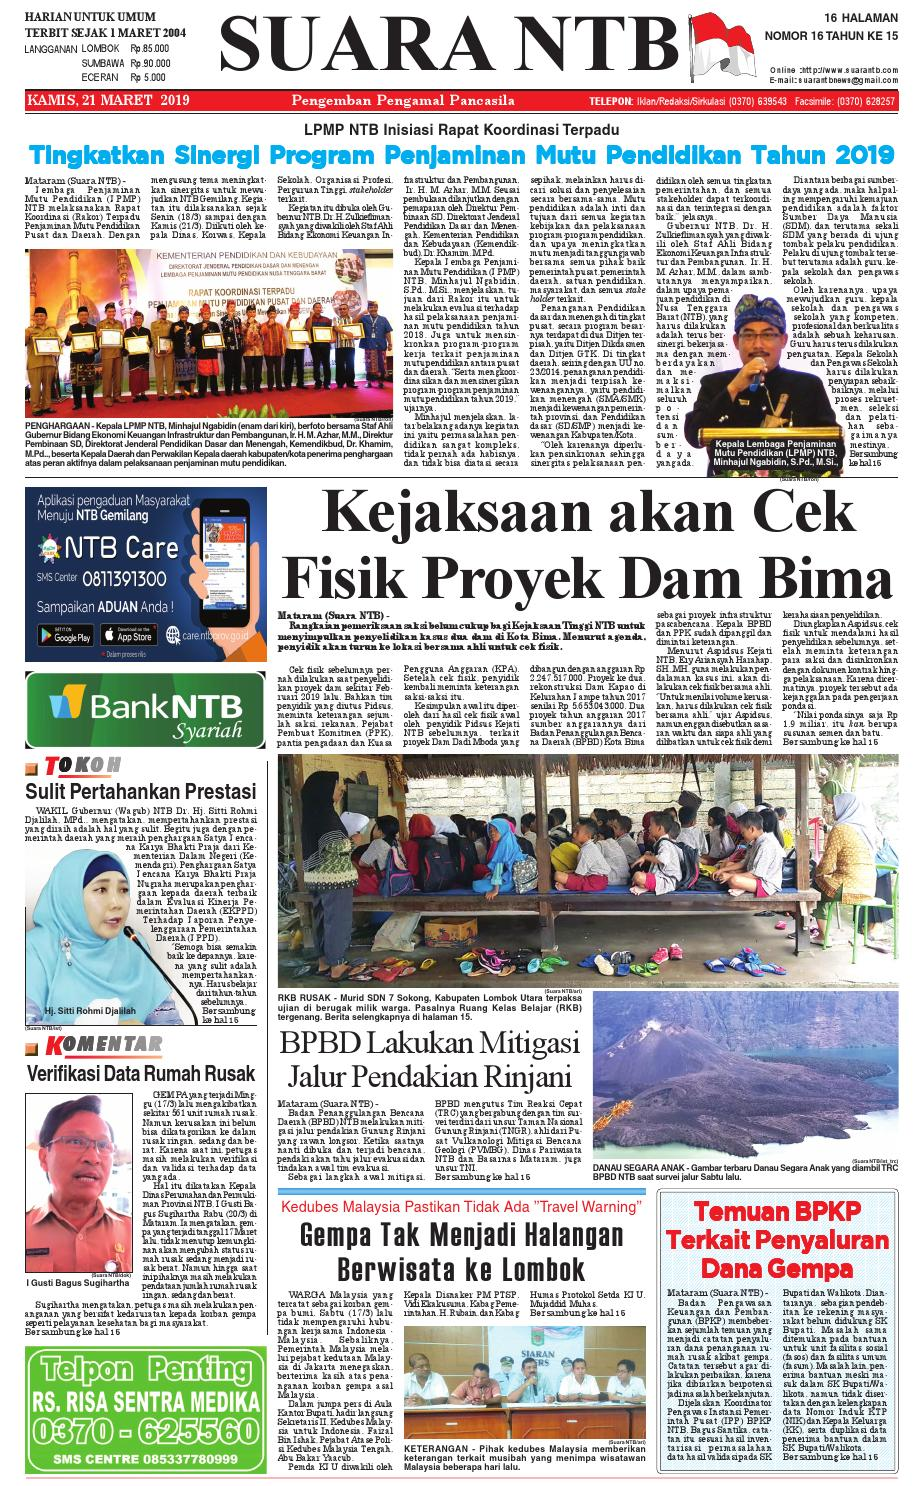 Edisi Kamis 21 Maret 2019 | Suara NTB by e-Paper KMB - issuu